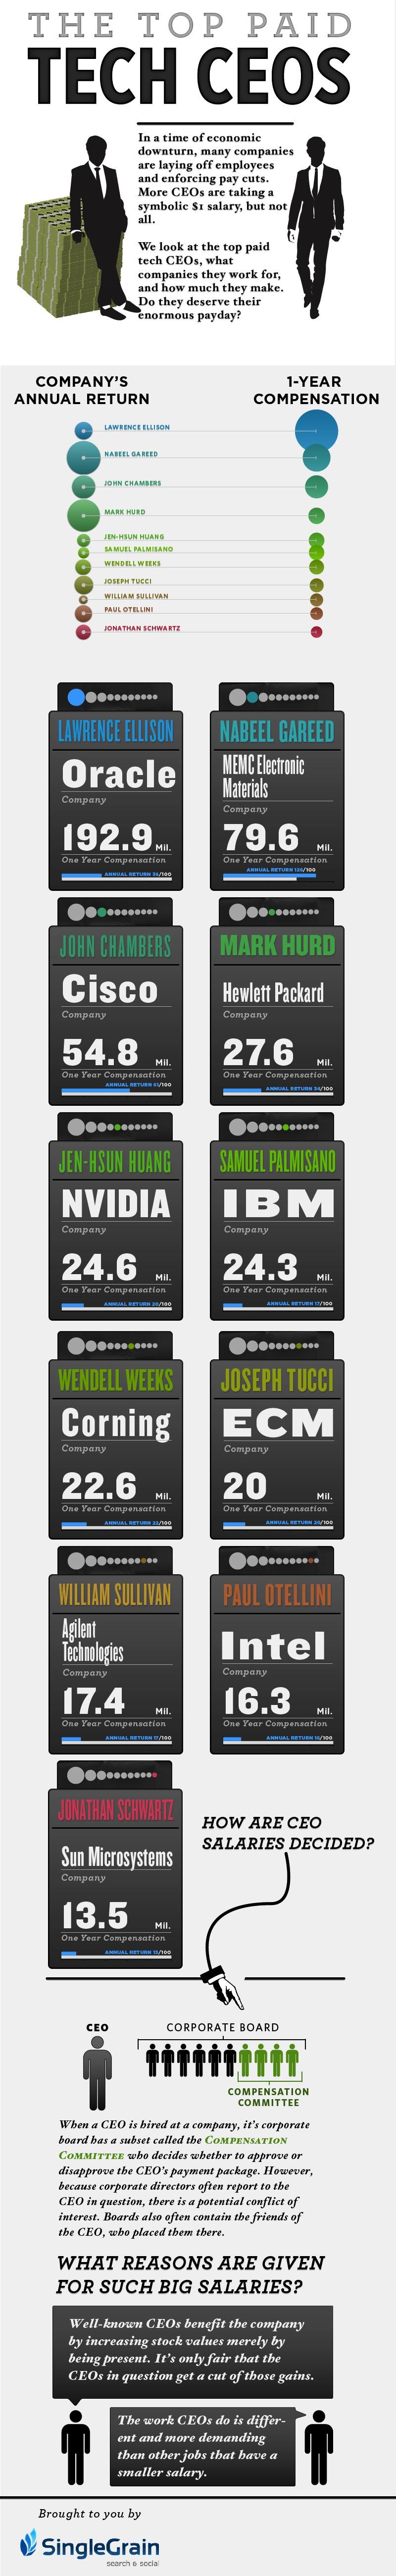 Top Paid CEOs in Technology/></noscript></a><br /> [Via:  <a href=